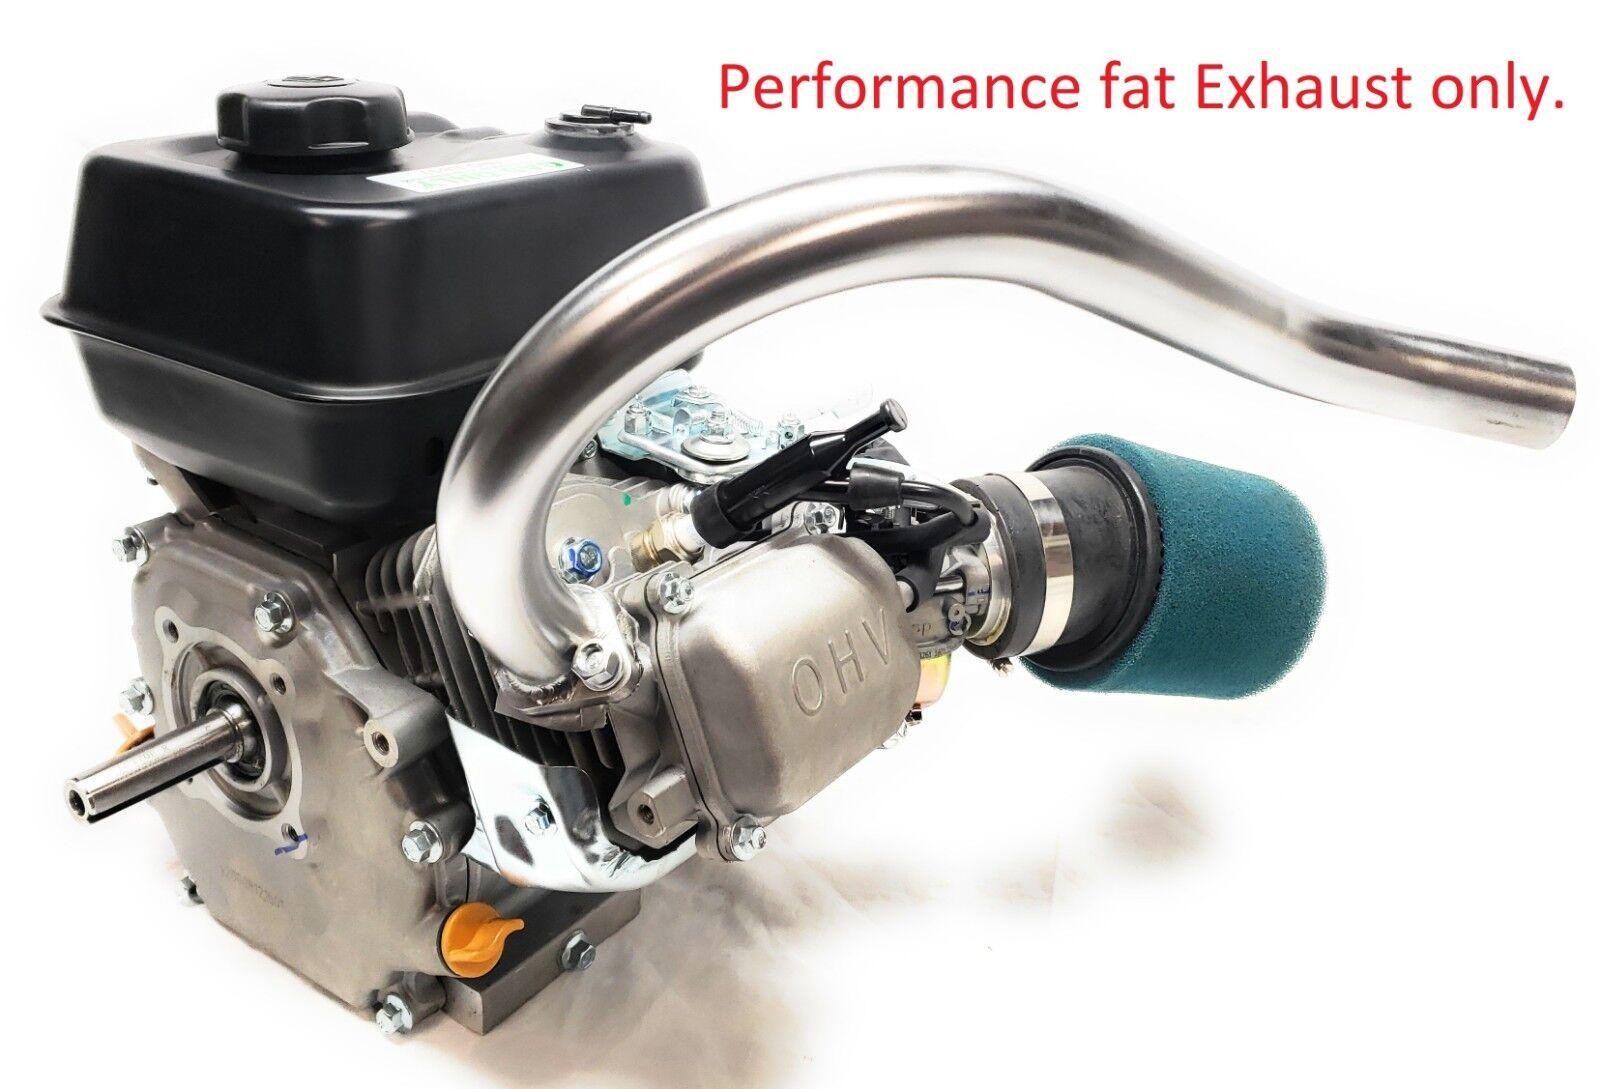 Drift Trike Performance Exhaust Header Pipe for Predator 212cc,Honda GX160,GX200